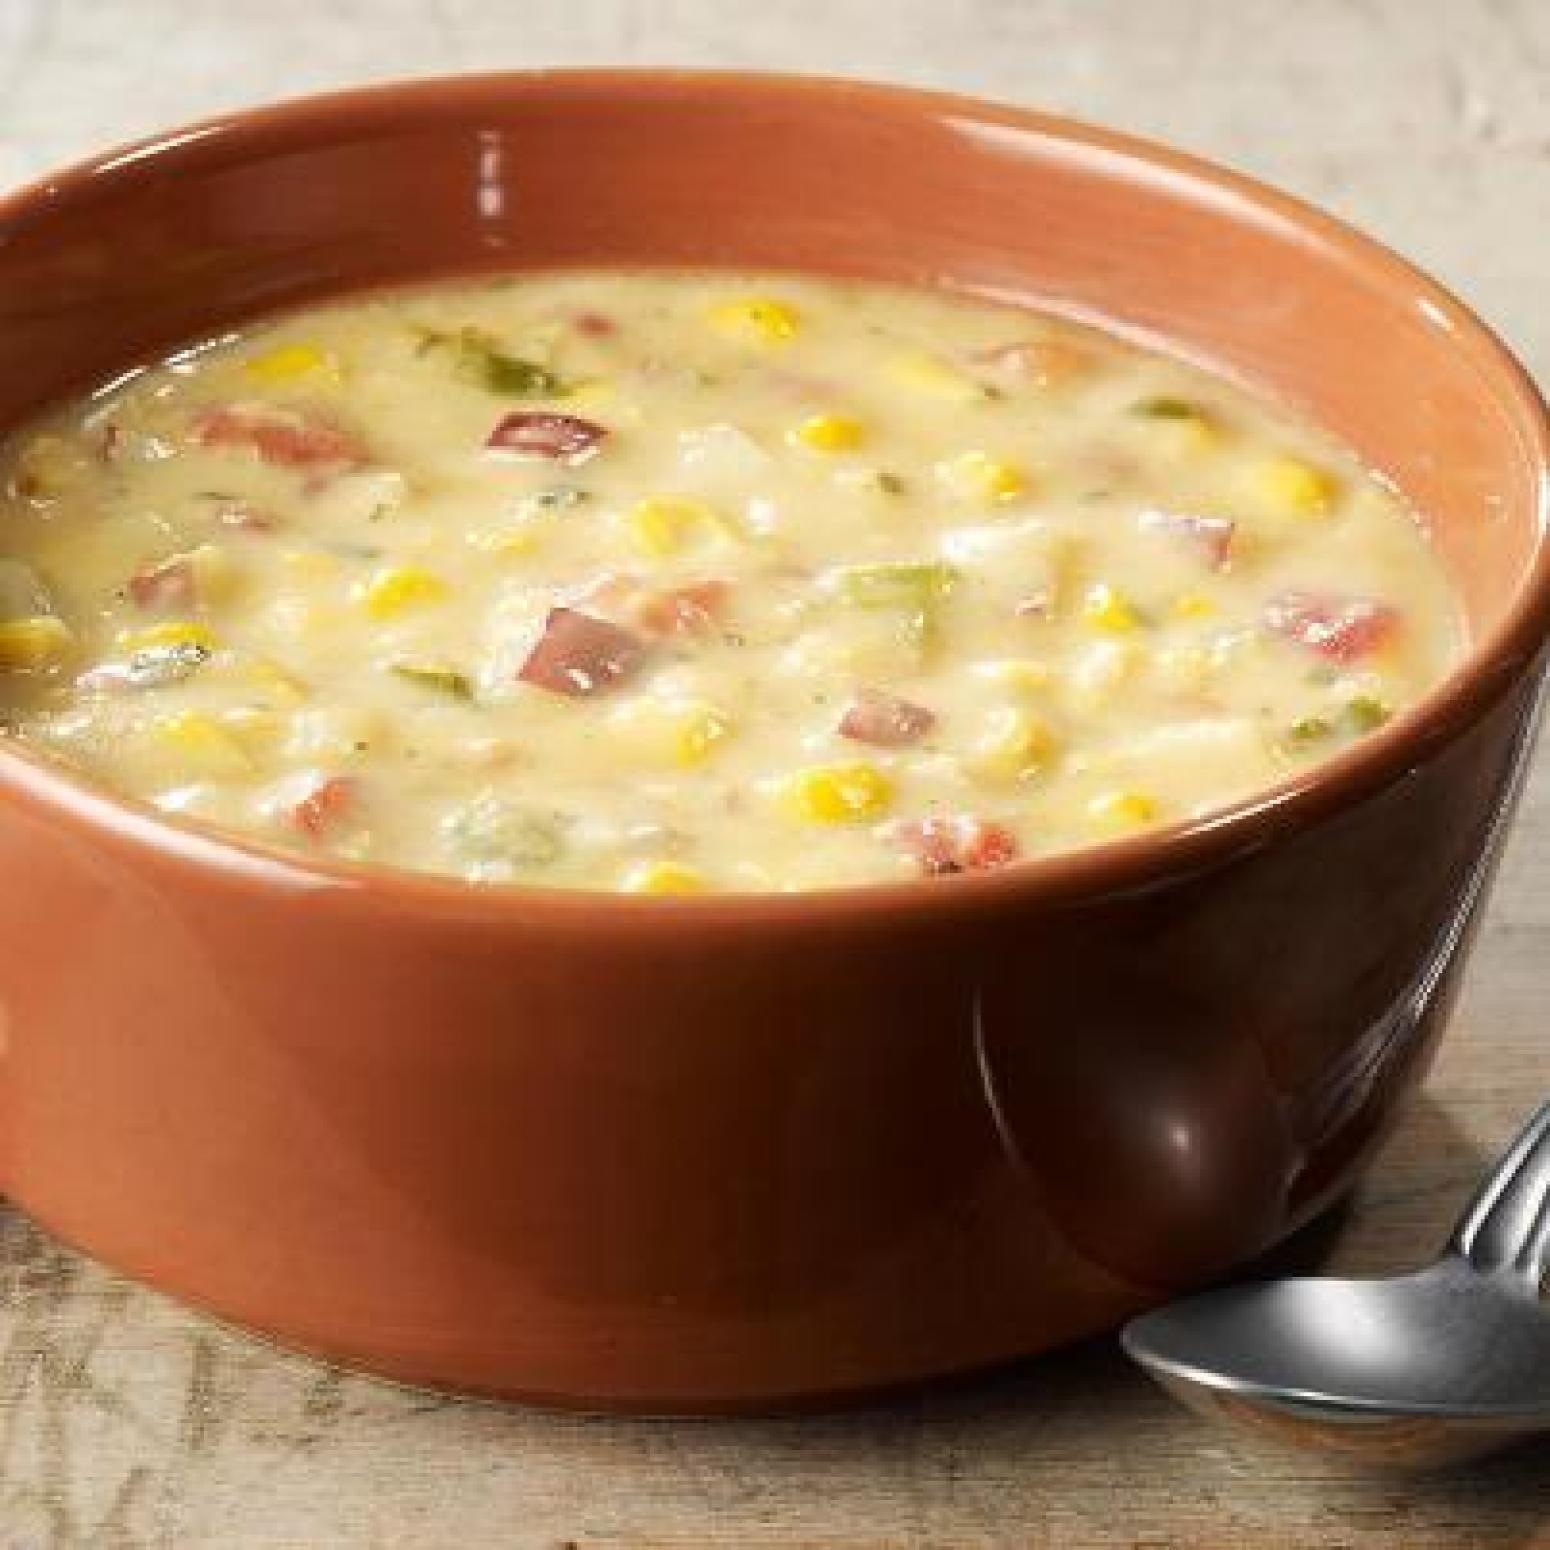 Panera Summer Corn Chowder Recipe  Panera Bread Summer Corn Chowder Copycat Recipe